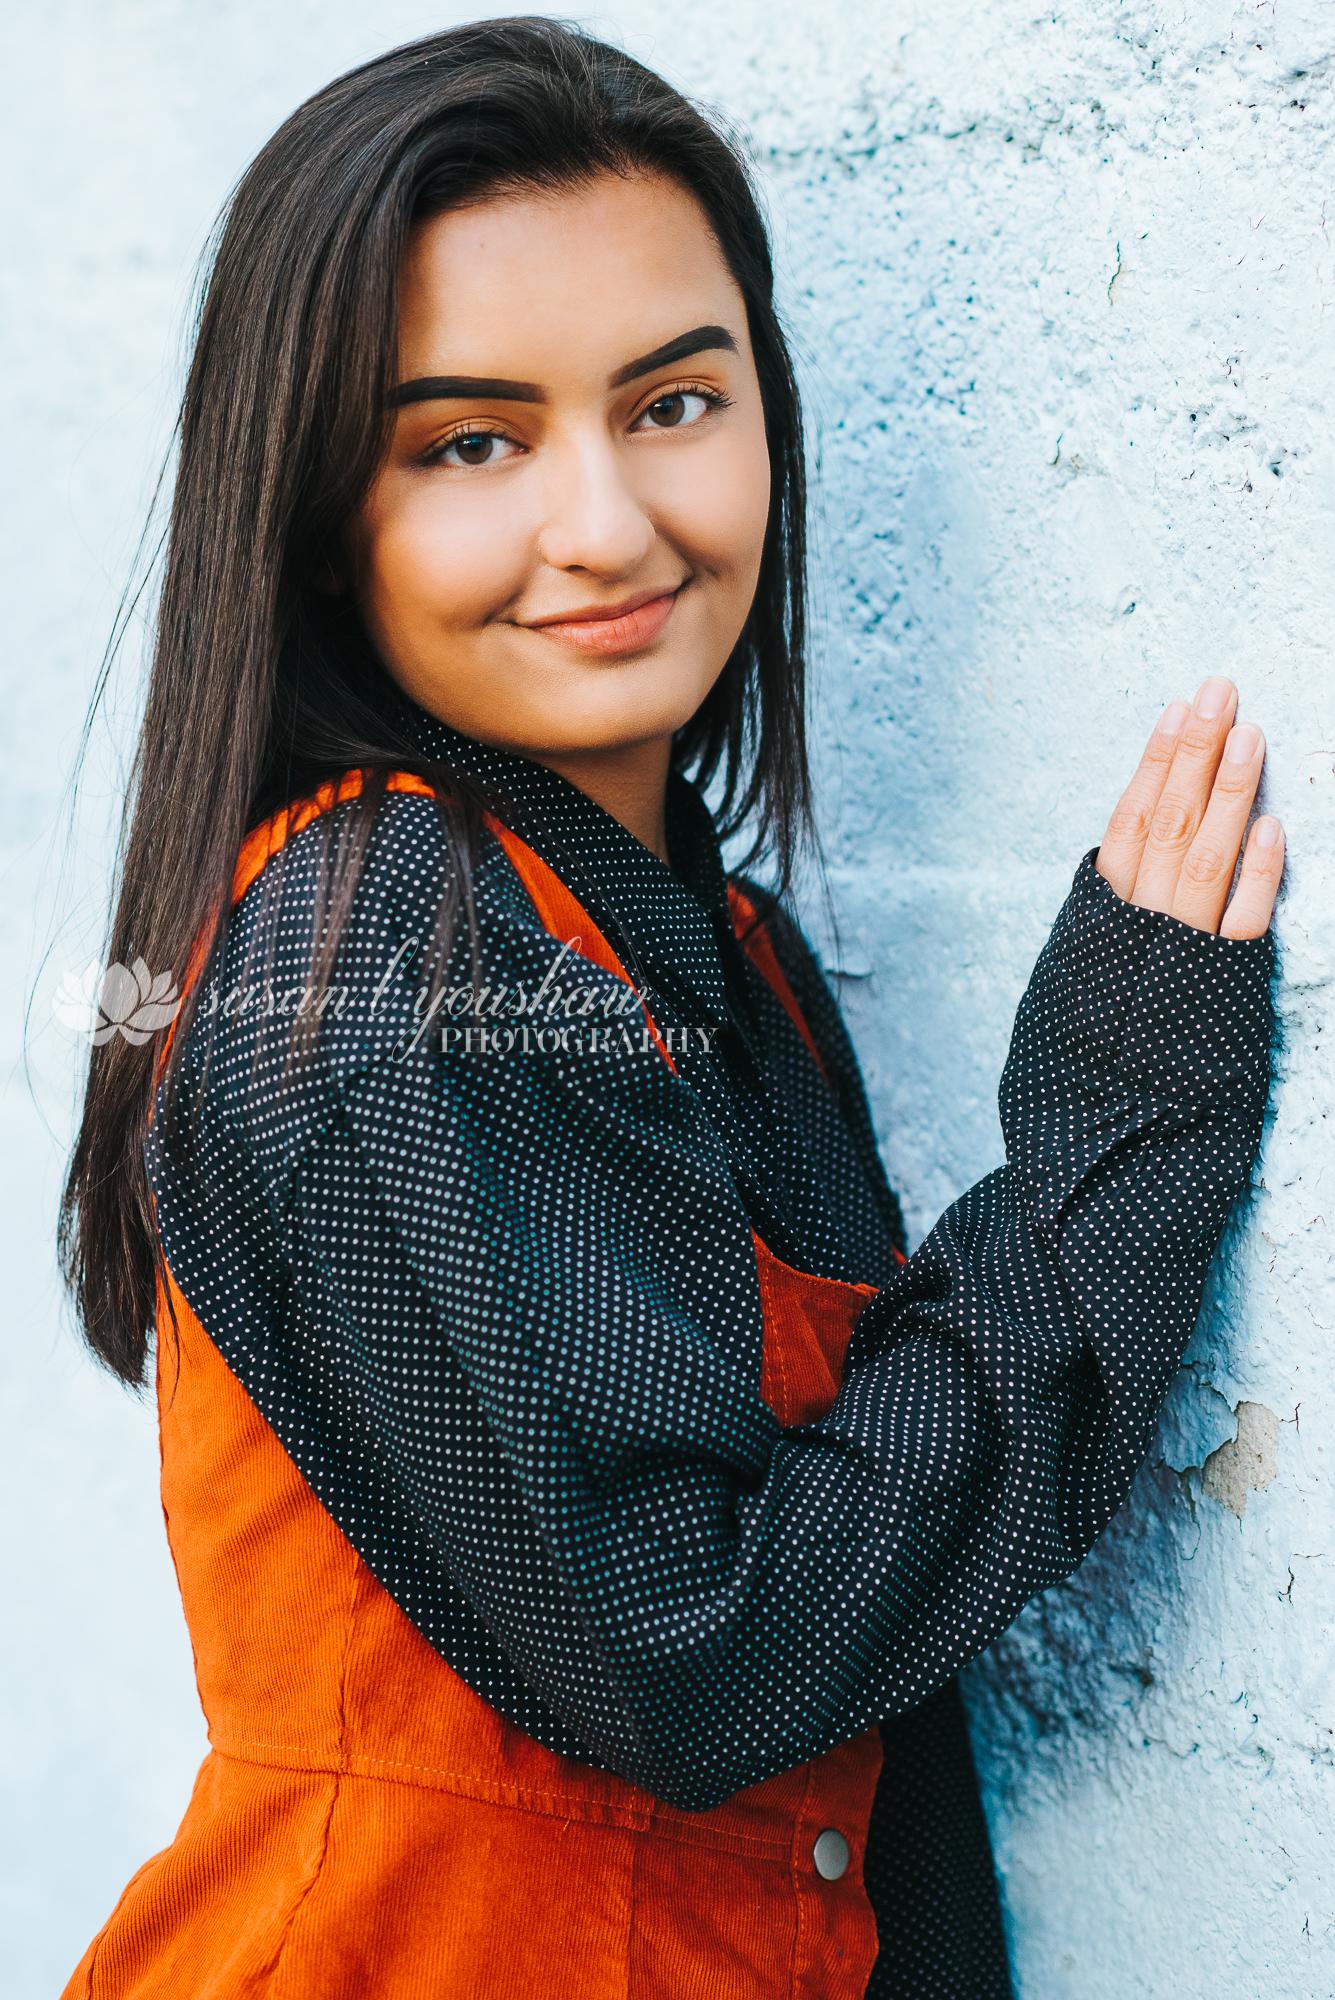 senior portraits rachel c 11-26-2018-16.jpg